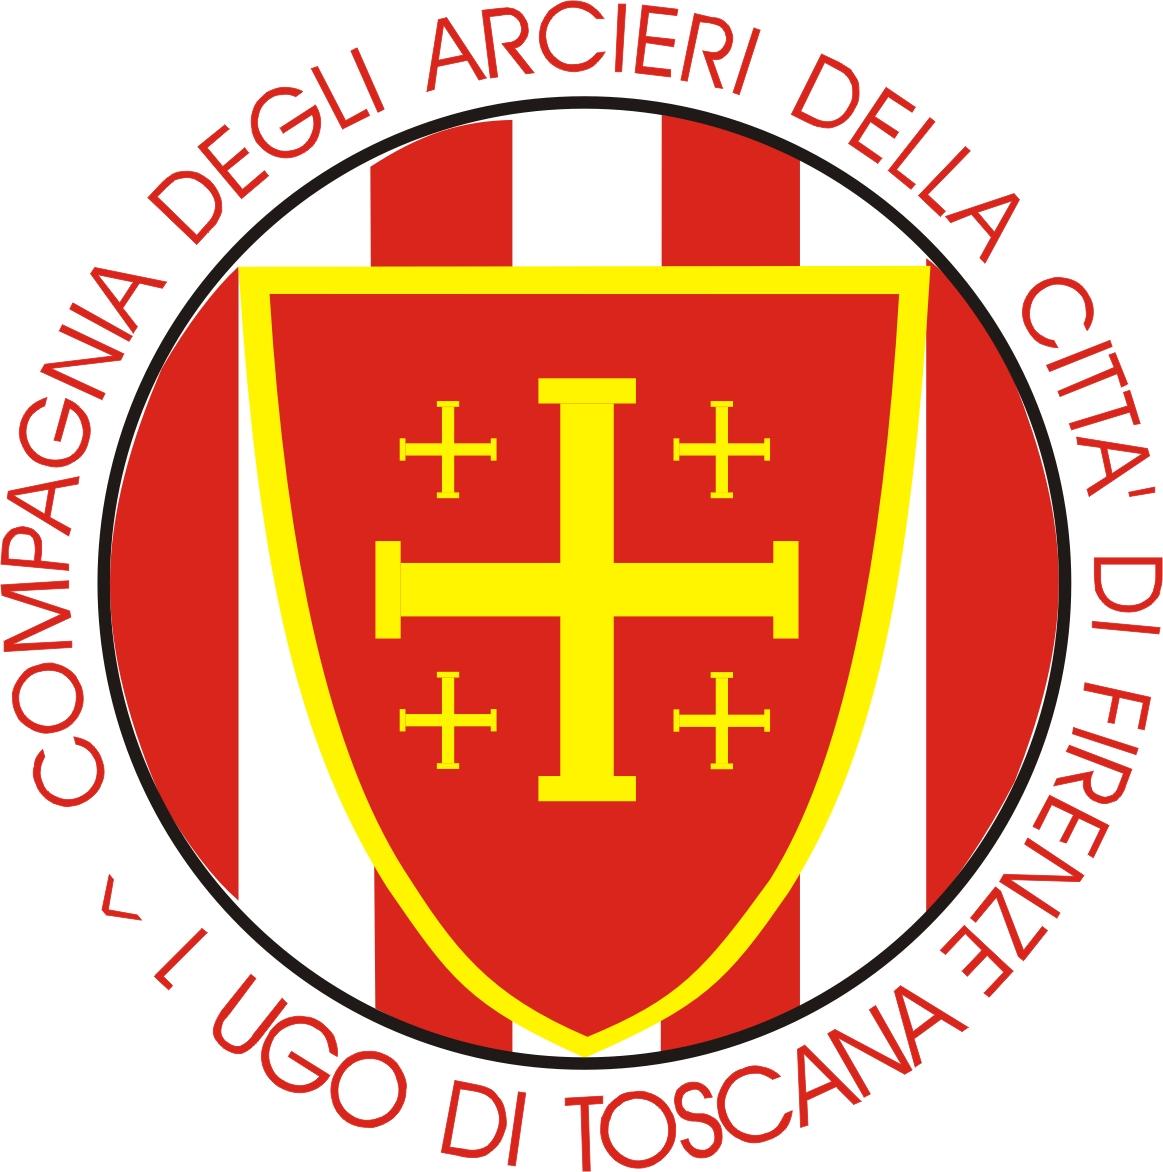 Calendario Gare Fitarco.Arcieri Ugo Di Toscana Arcieri A Firenze